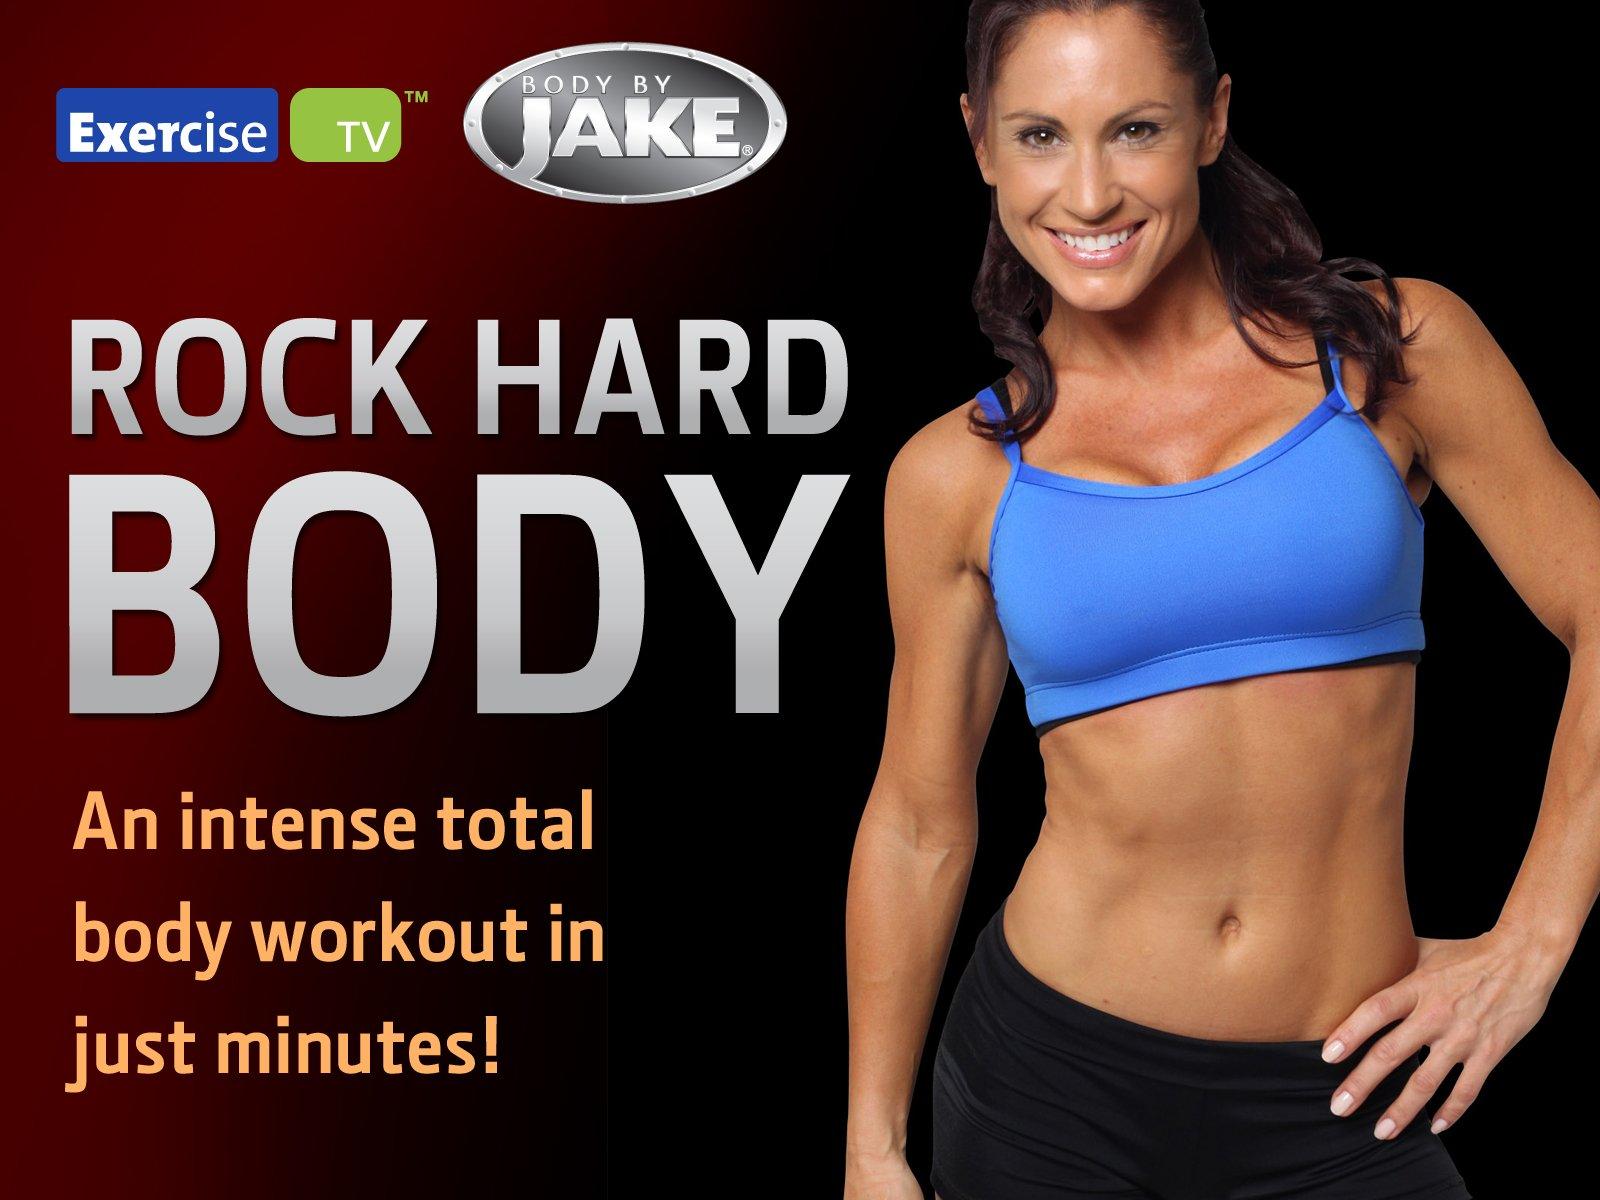 Get a Rock-Hard Body